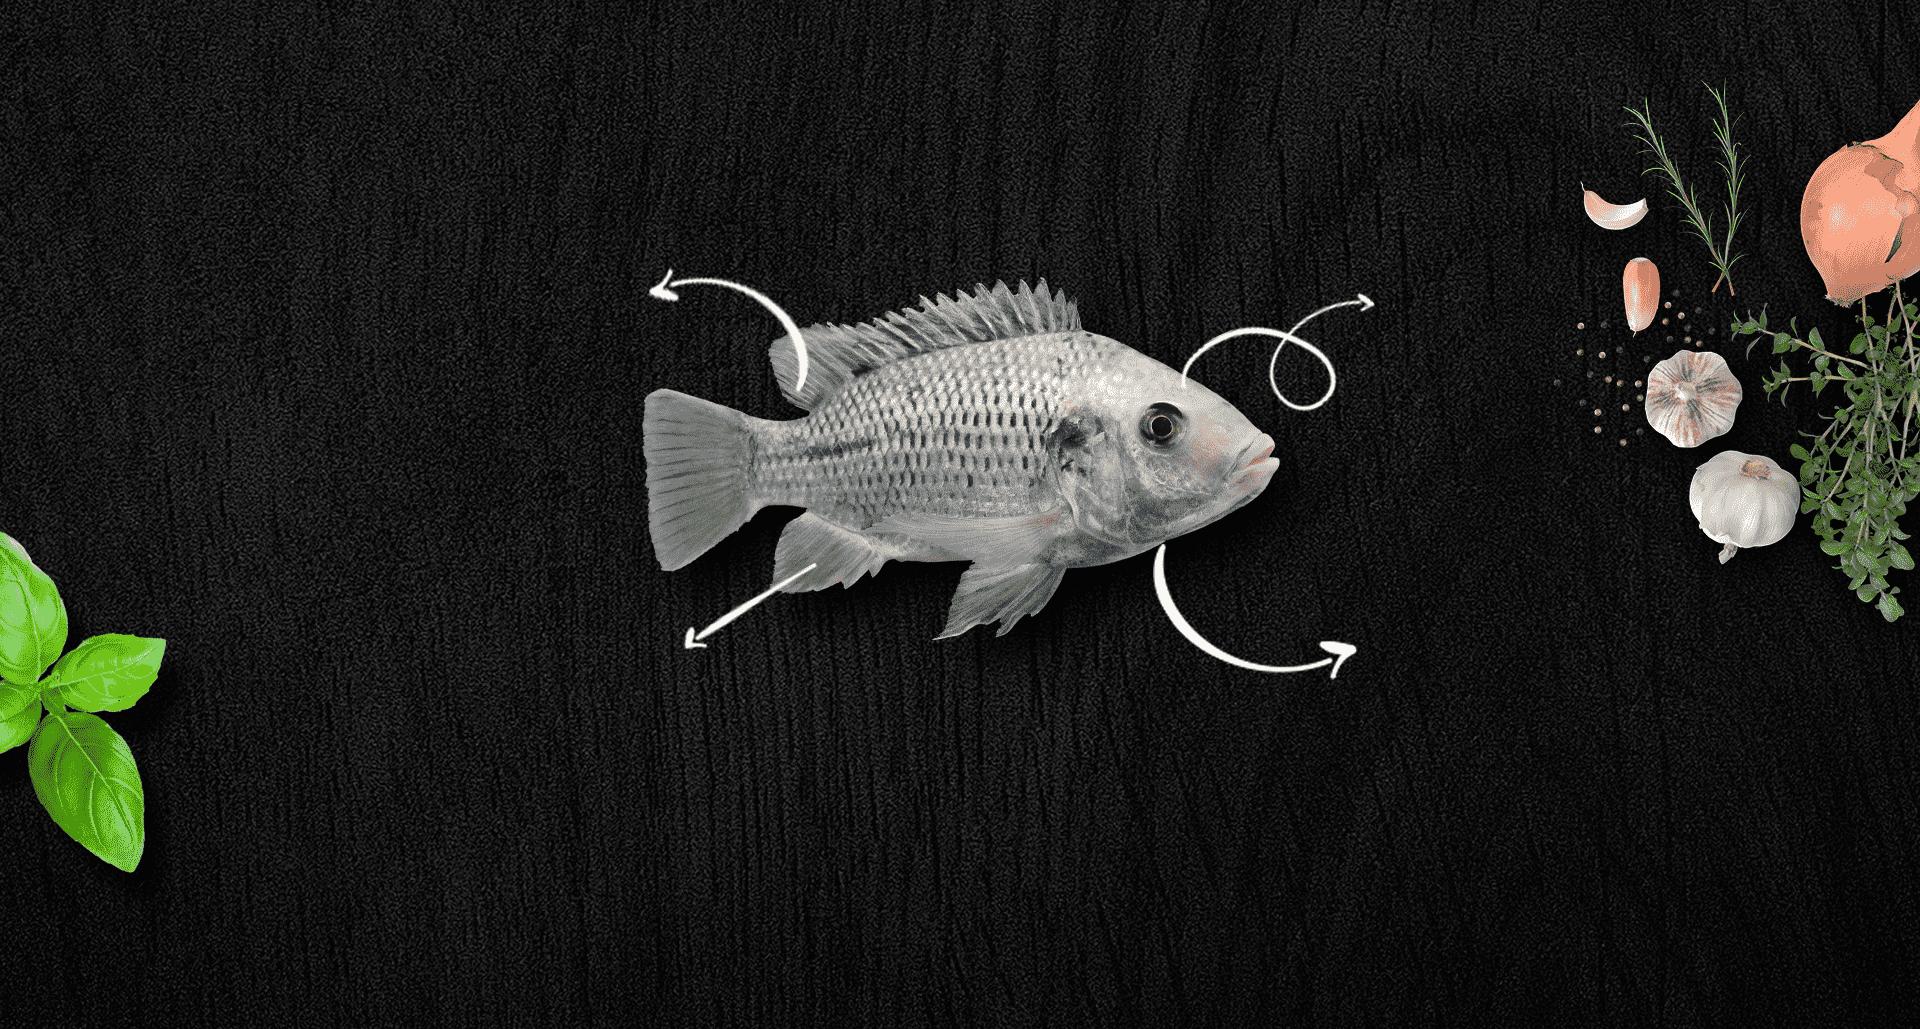 דג אמנון